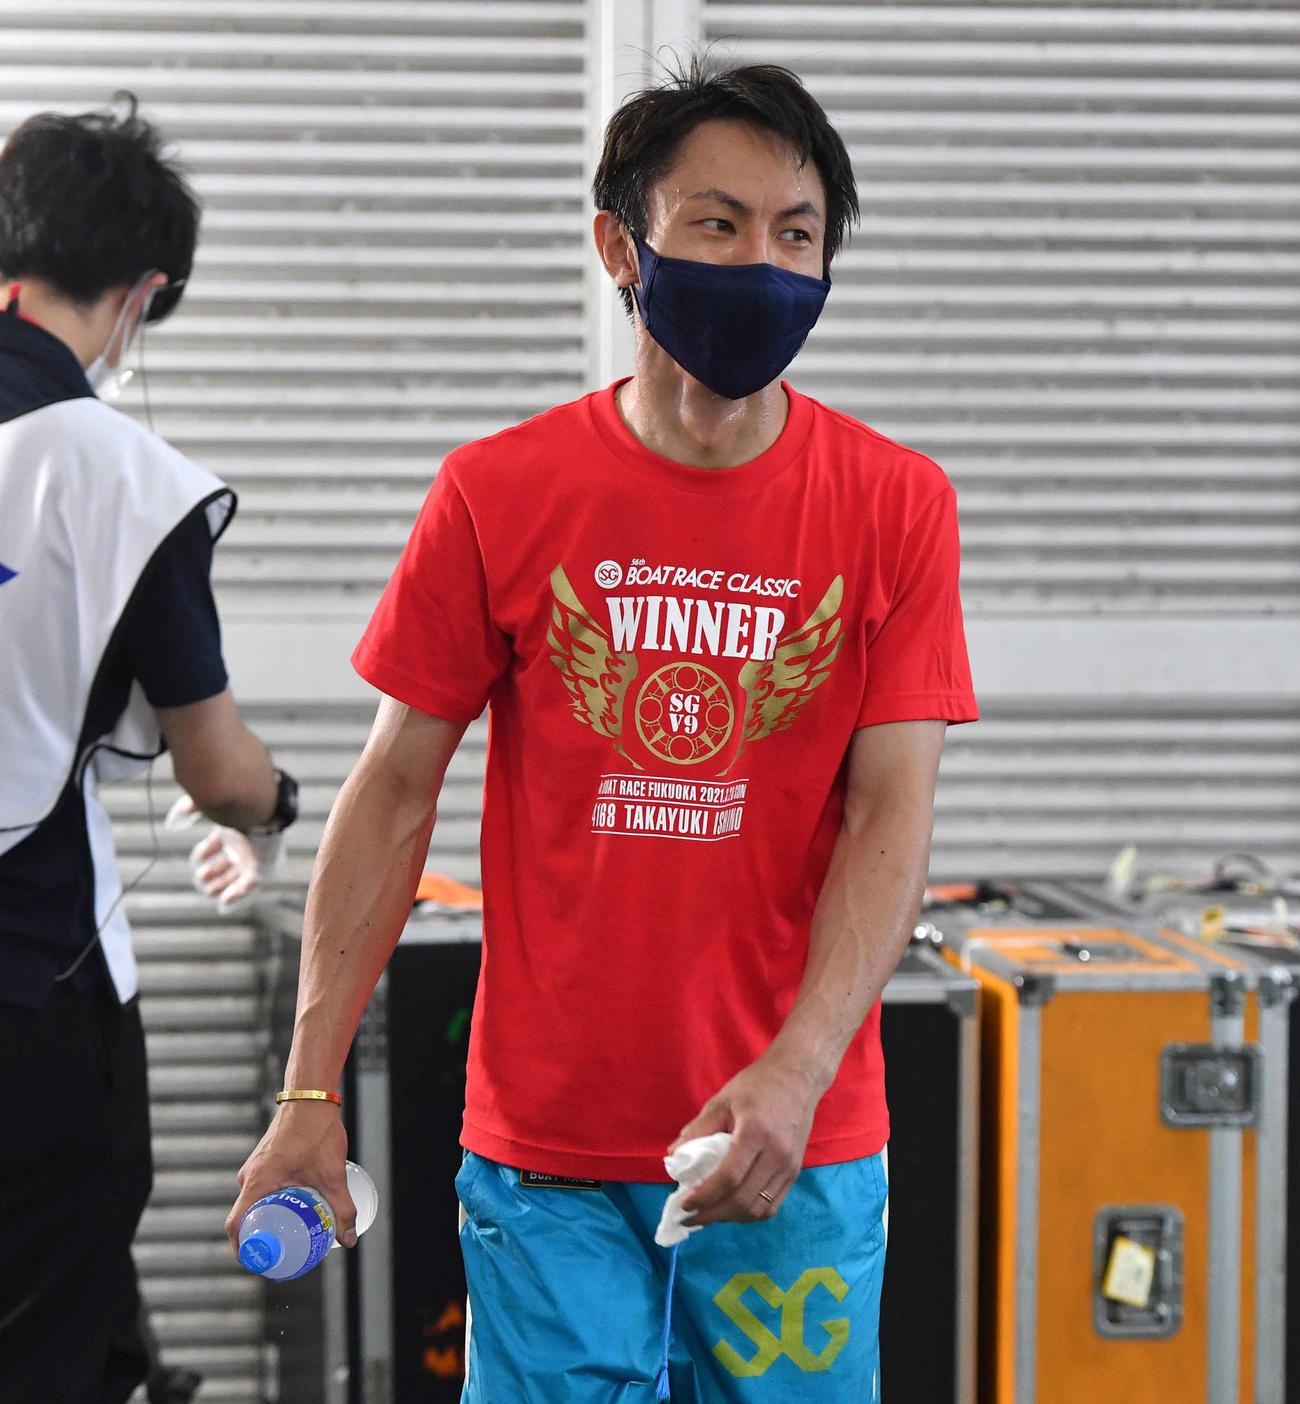 SGグランドチャンピオン2日目 4R、1着の4266長田頼宗(撮影・岩下翔太)